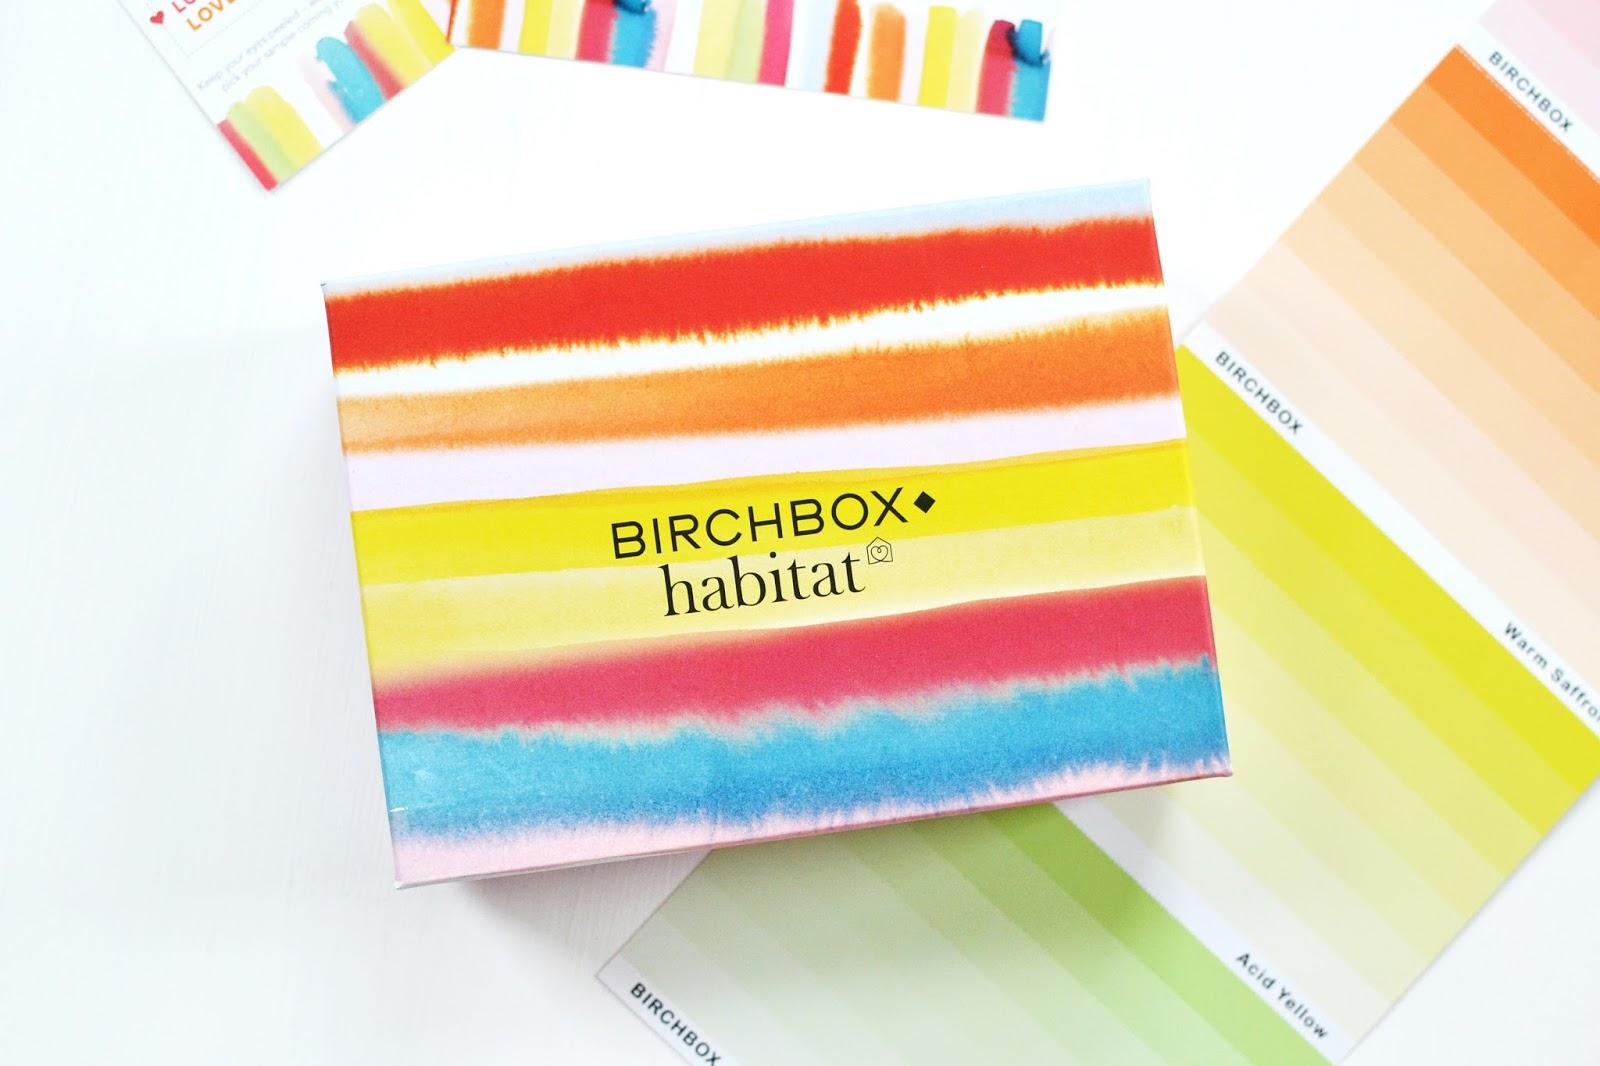 birchbox march 2015, birchbox, birchbox and habitat